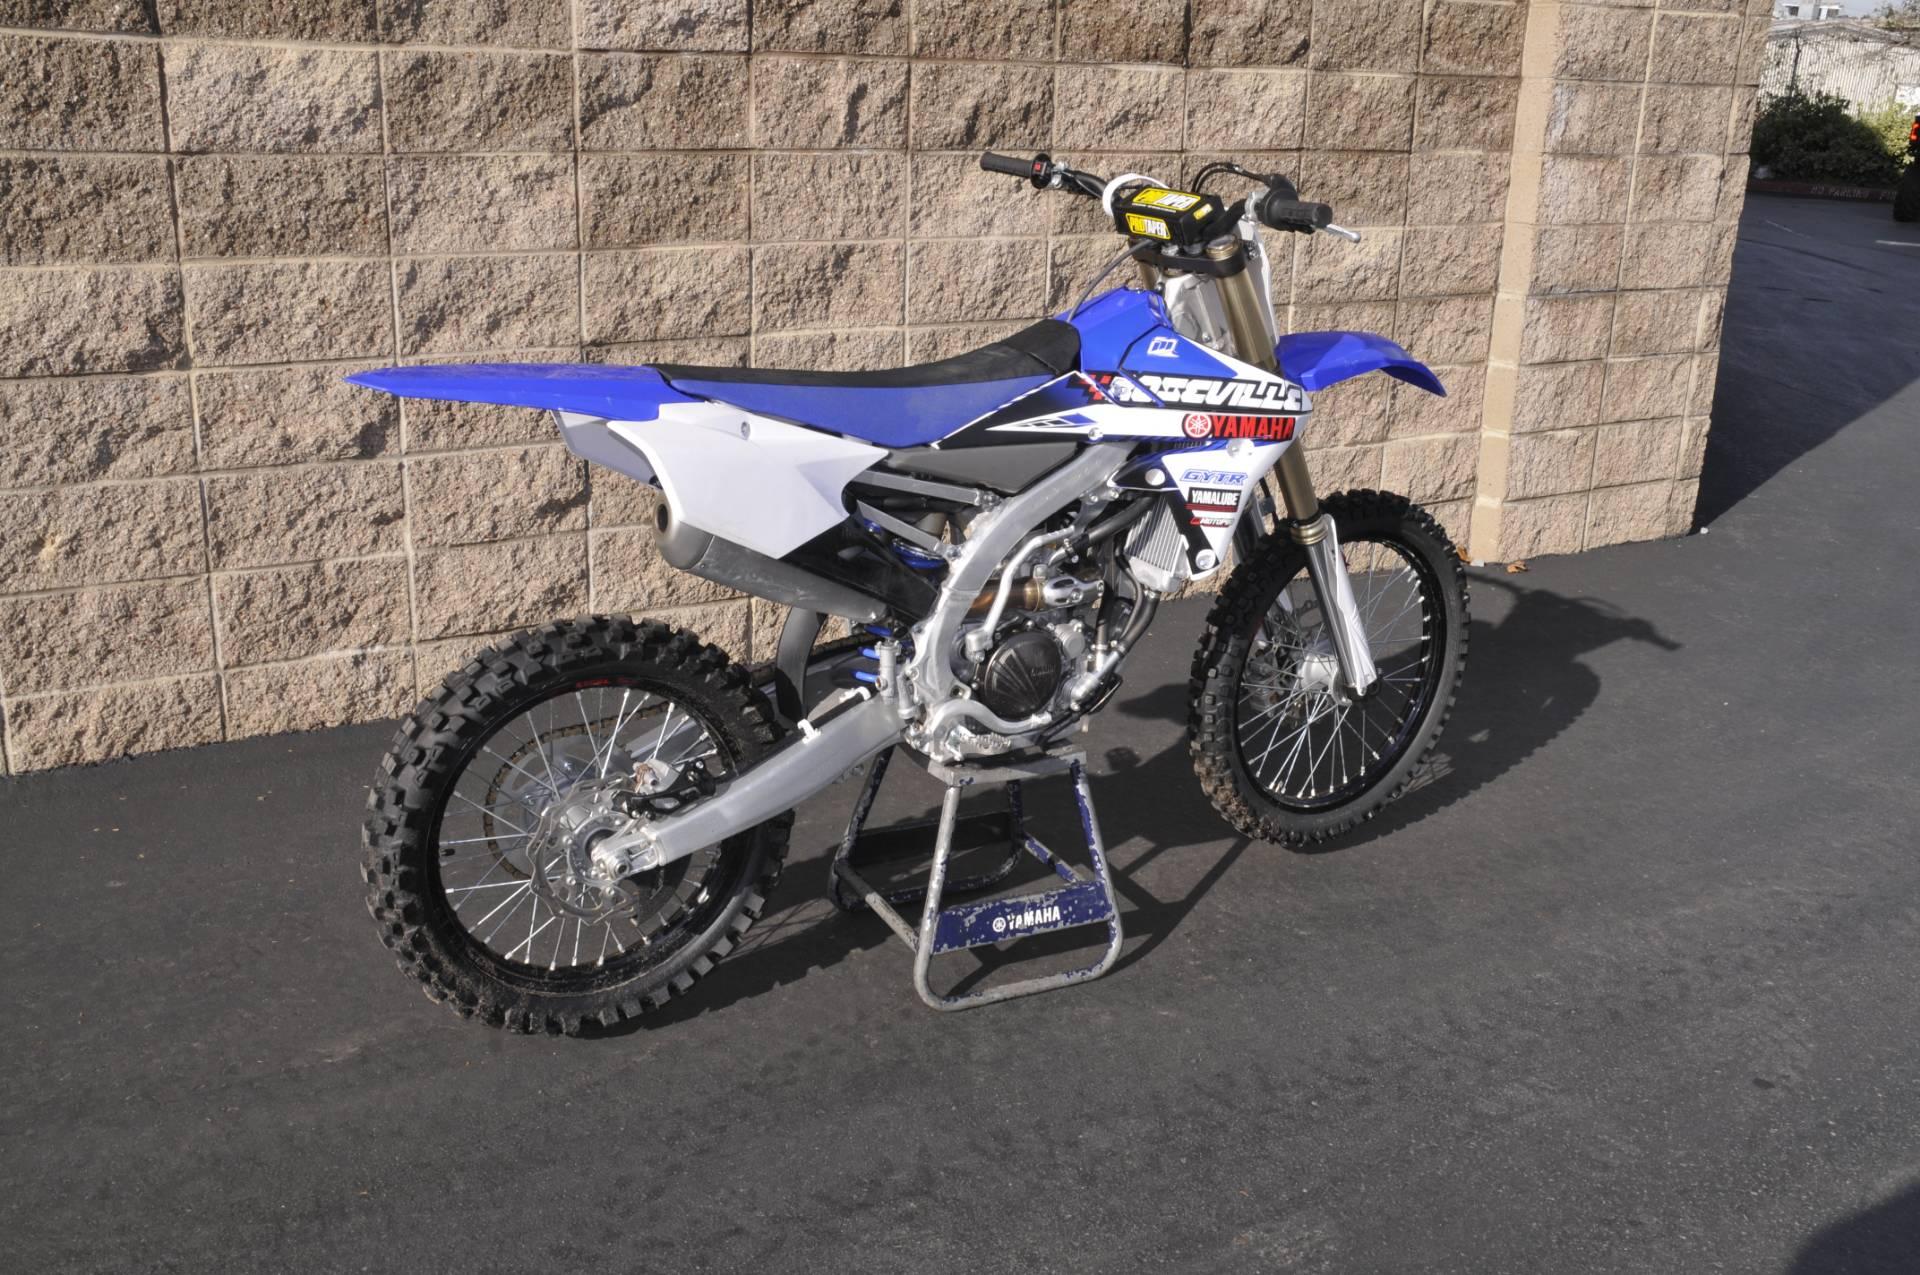 2016 Yamaha YZ250F in Roseville, California